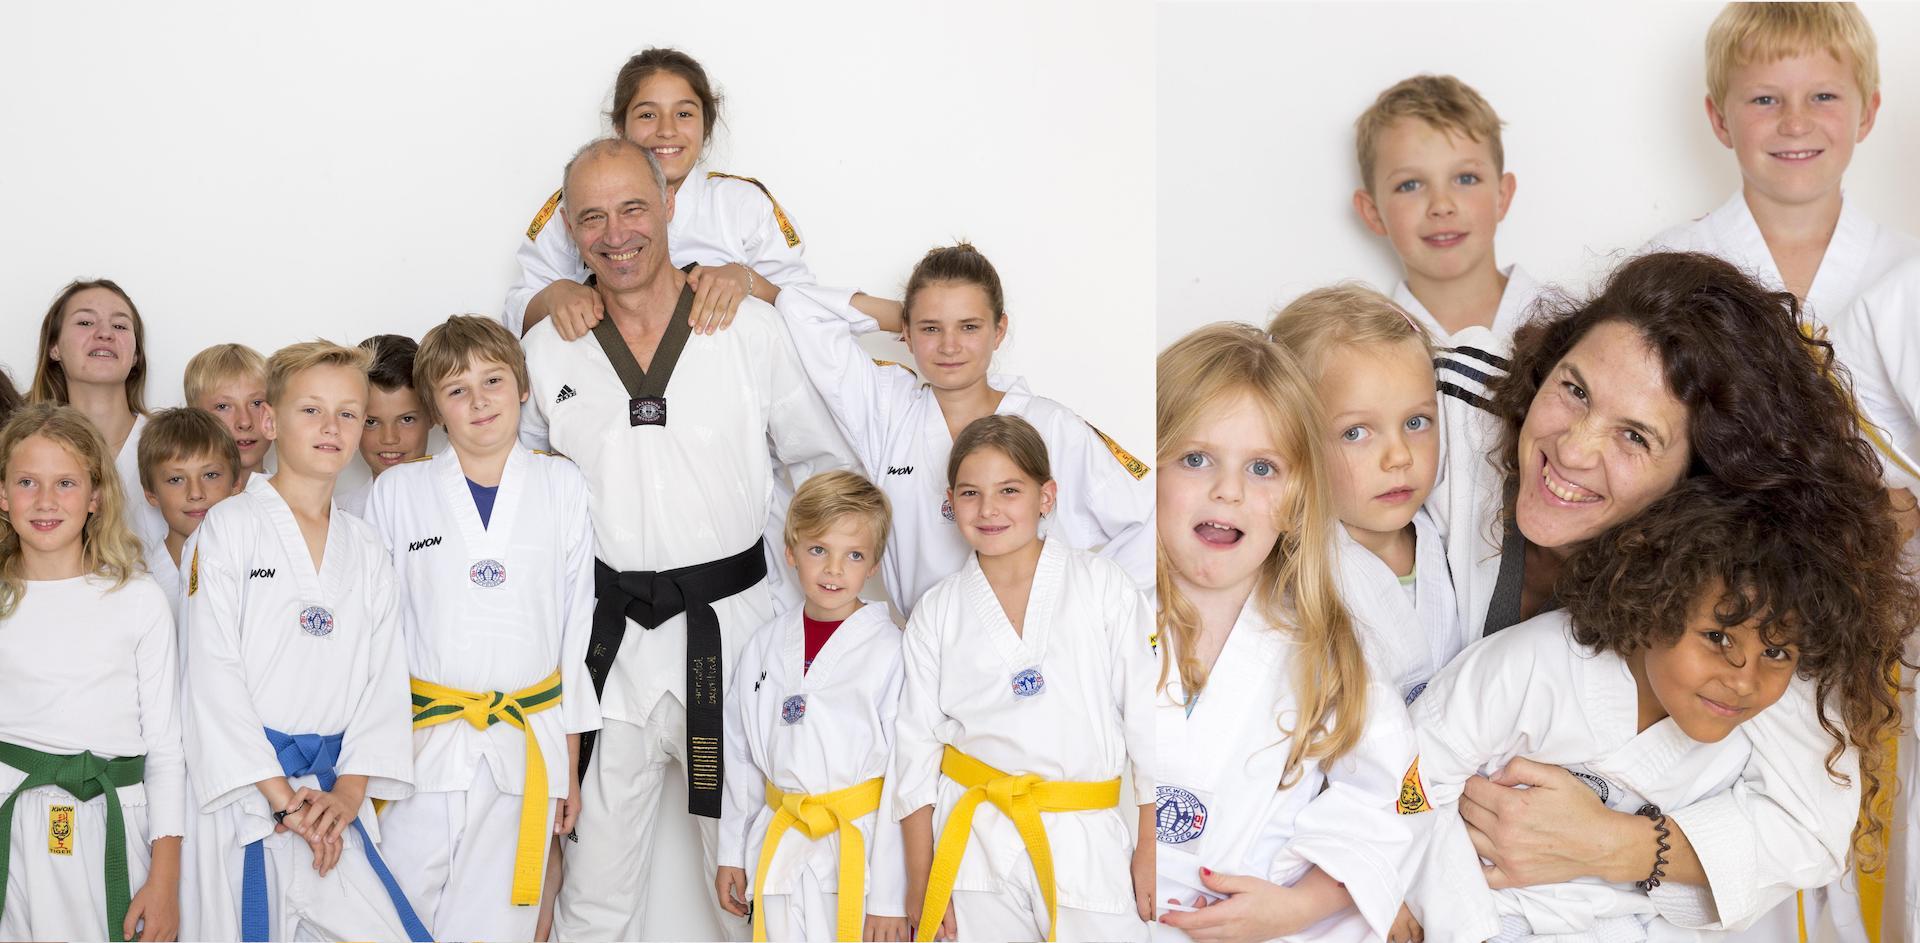 Gruppenbild Taekwondo Ammersee